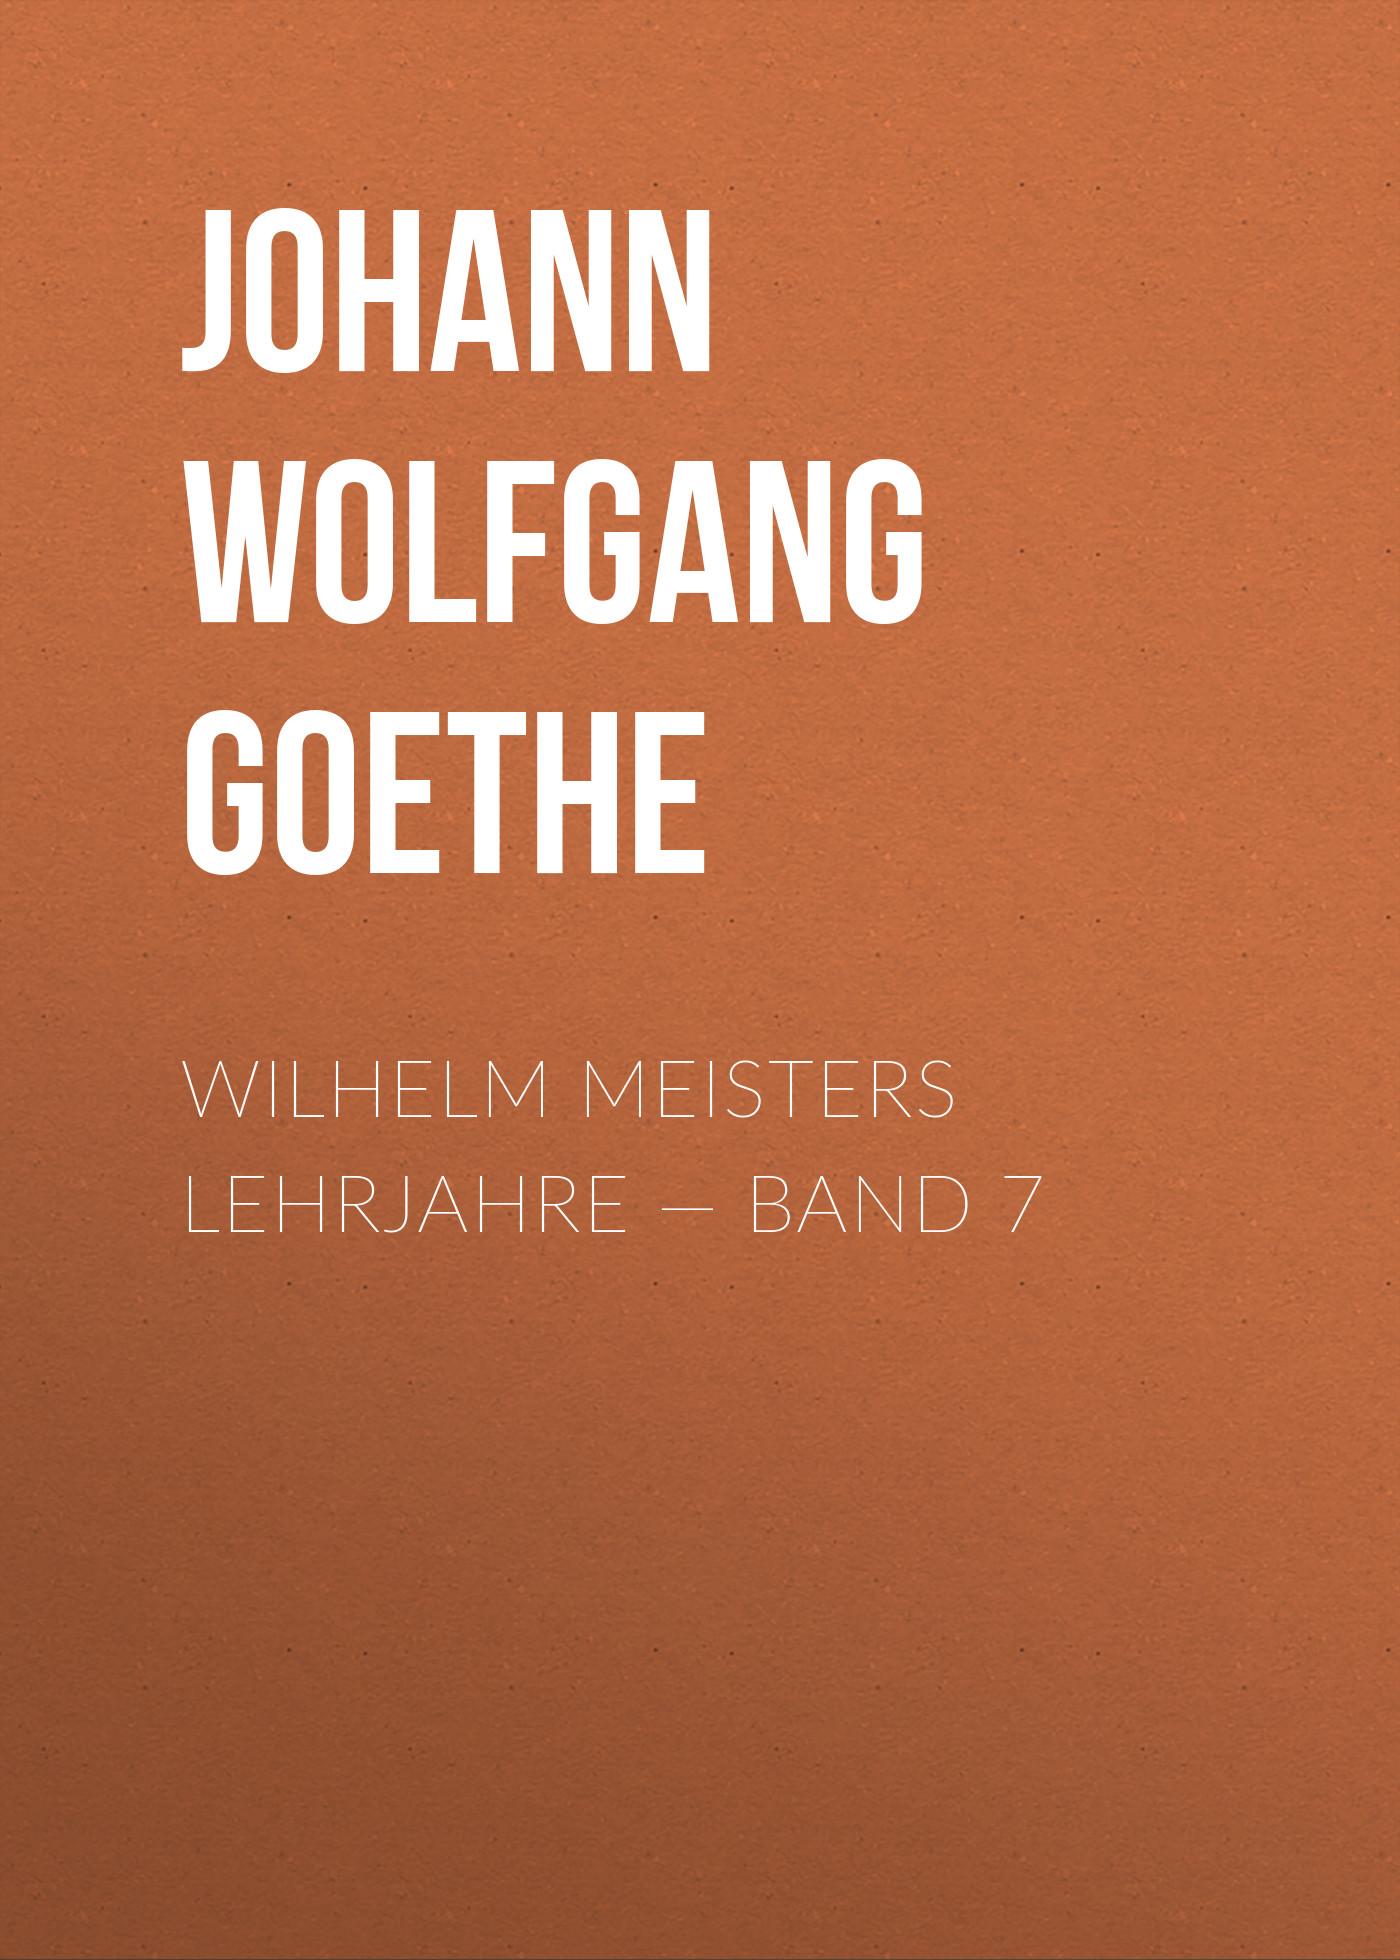 Иоганн Вольфганг фон Гёте Wilhelm Meisters Lehrjahre — Band 7